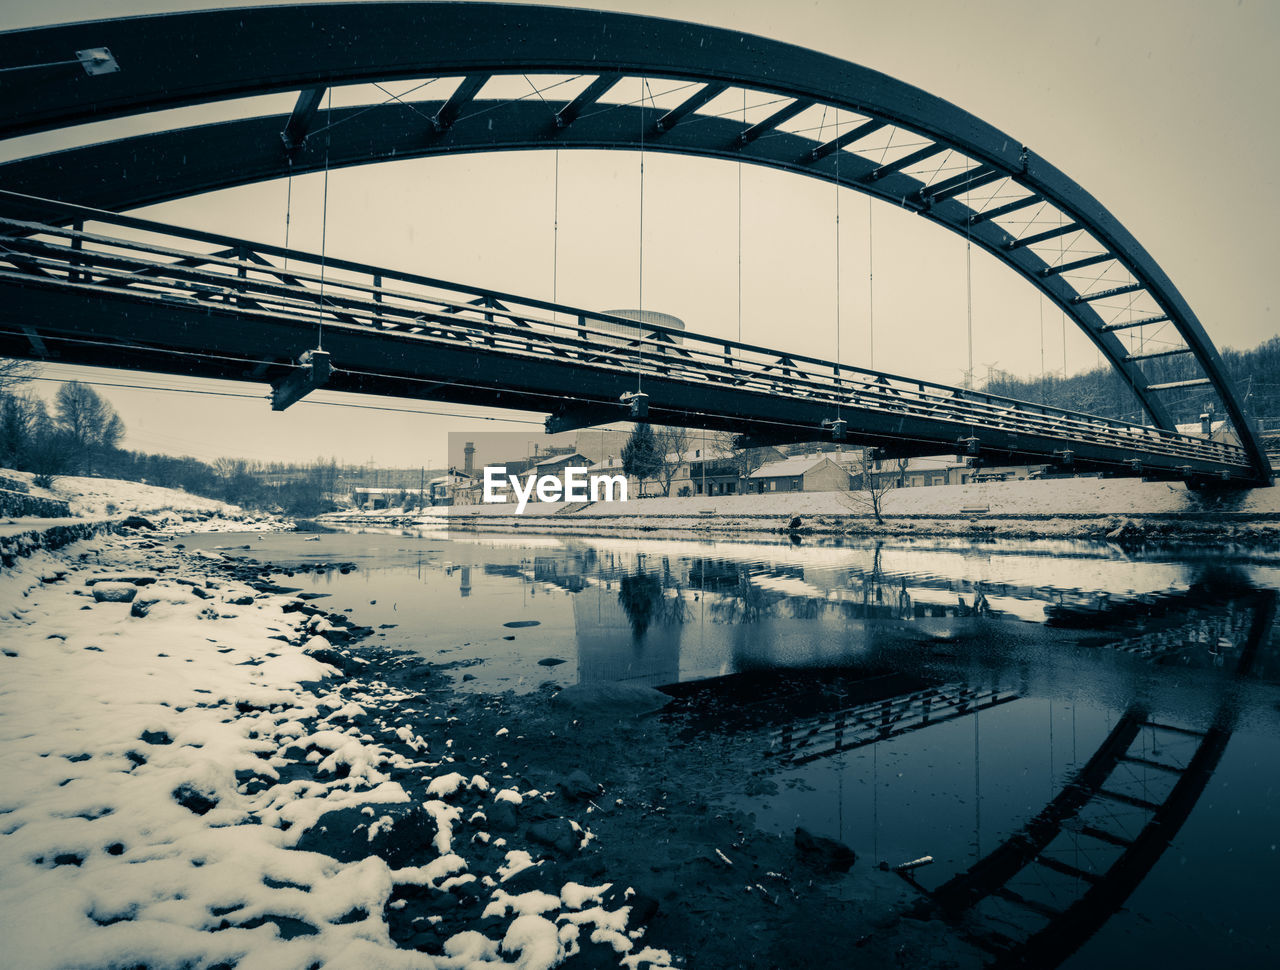 REFLECTION OF BRIDGE AGAINST SKY